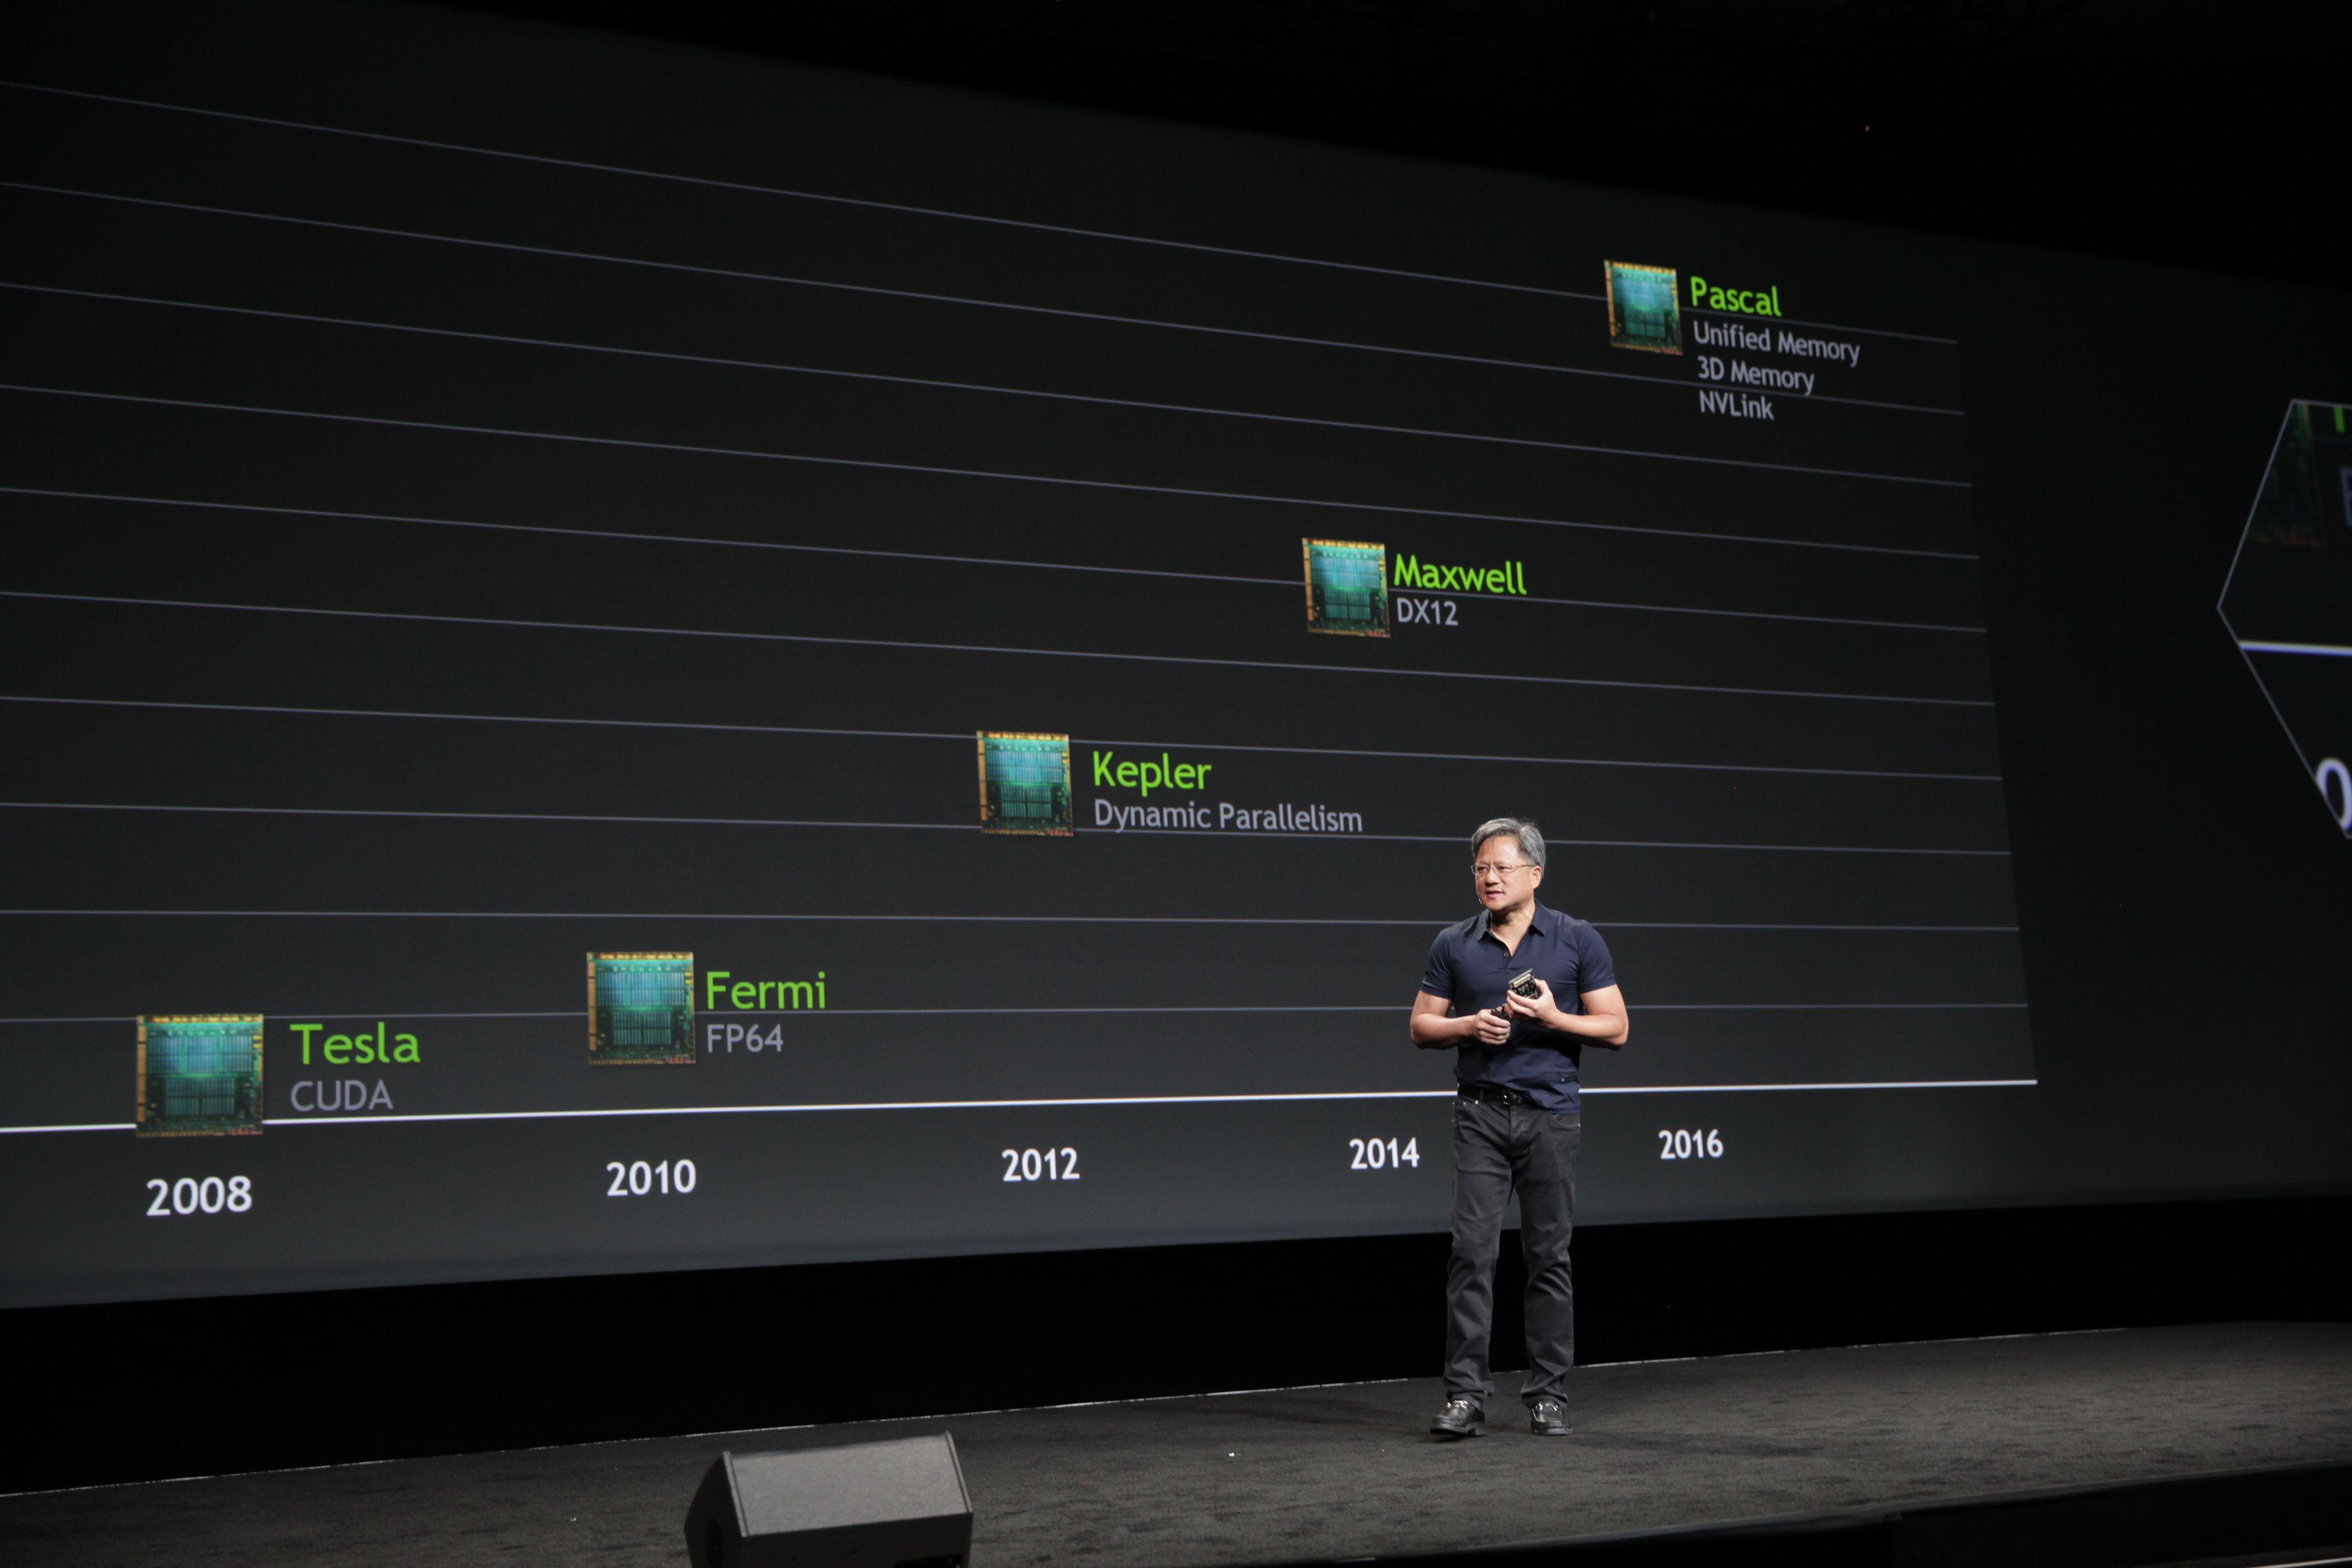 Pascal kommer i 2016.Foto: Nvidia